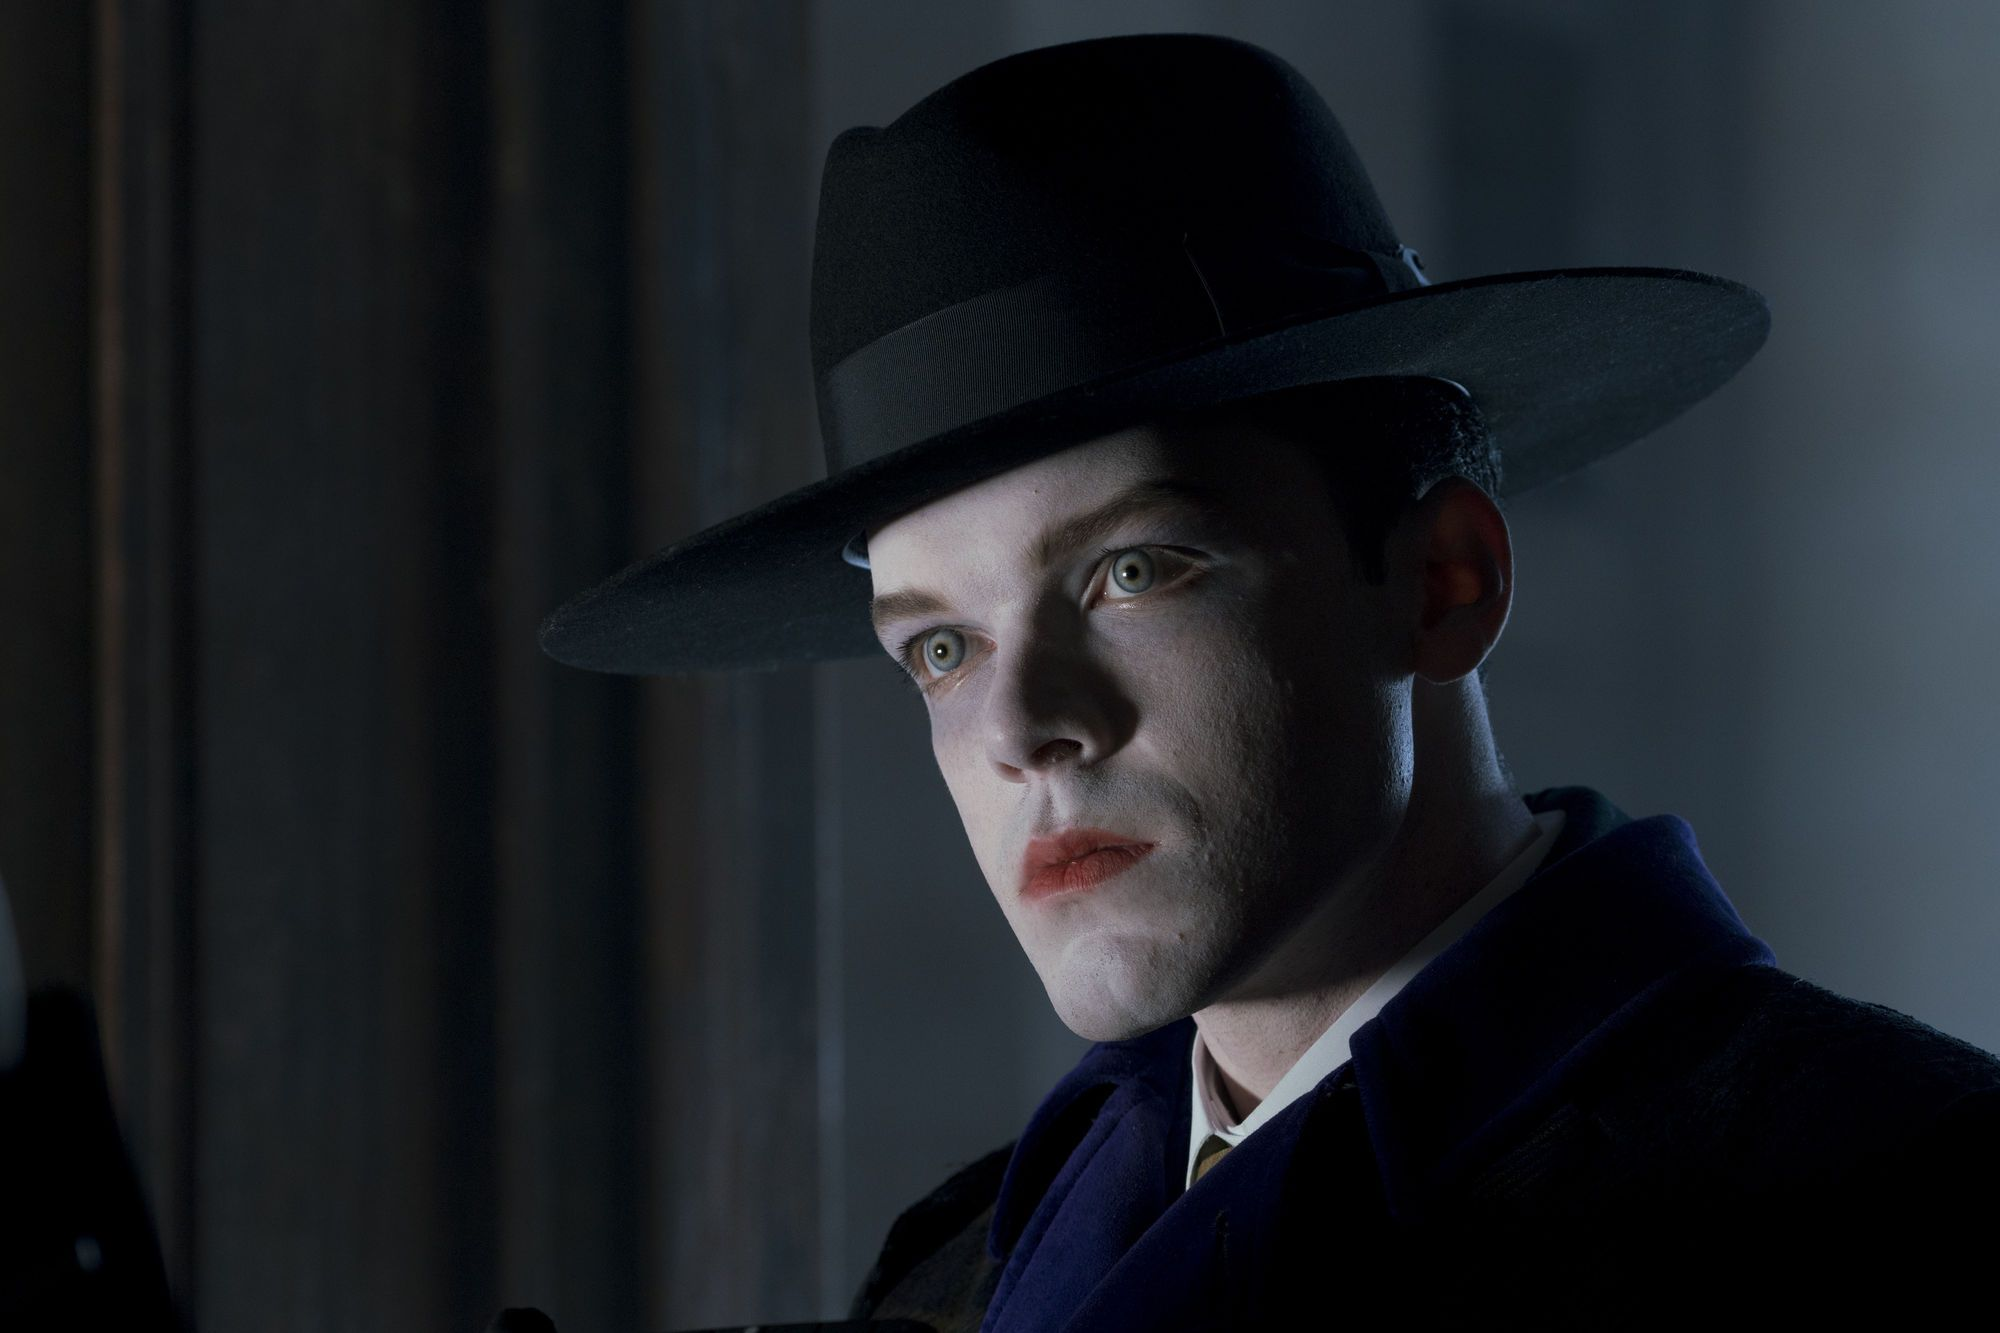 Cameron Monaghan as Jeremiah Valeska, Gotham, Season 4